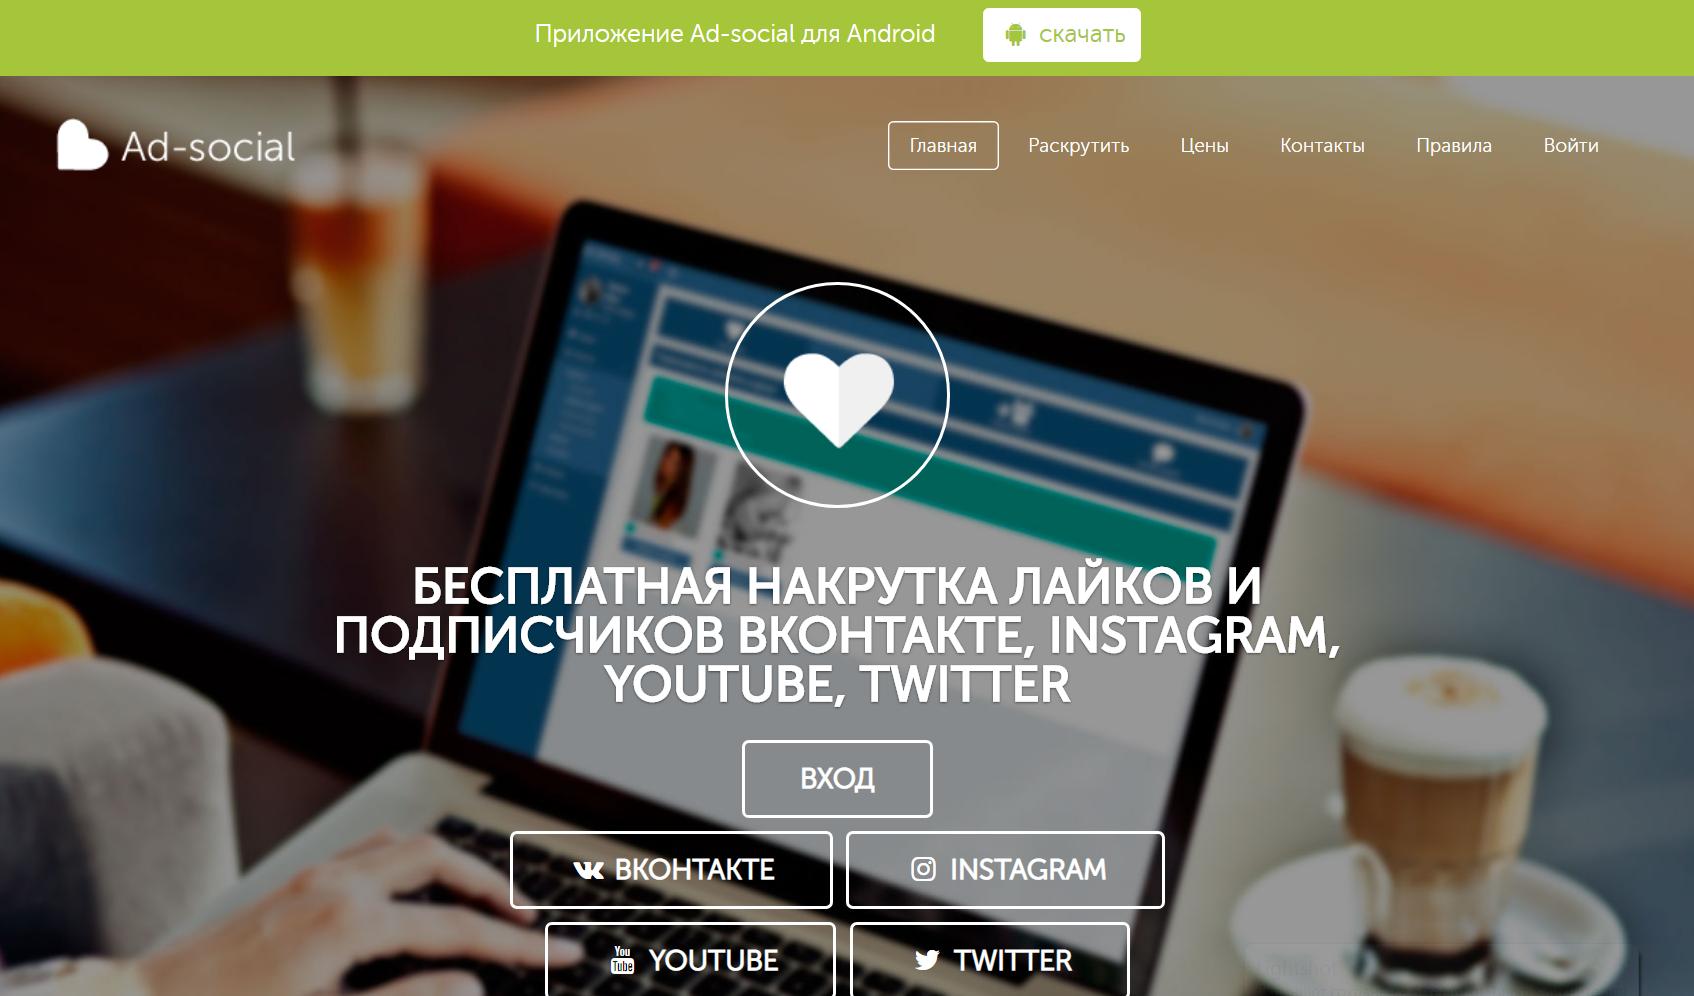 ad-social.org